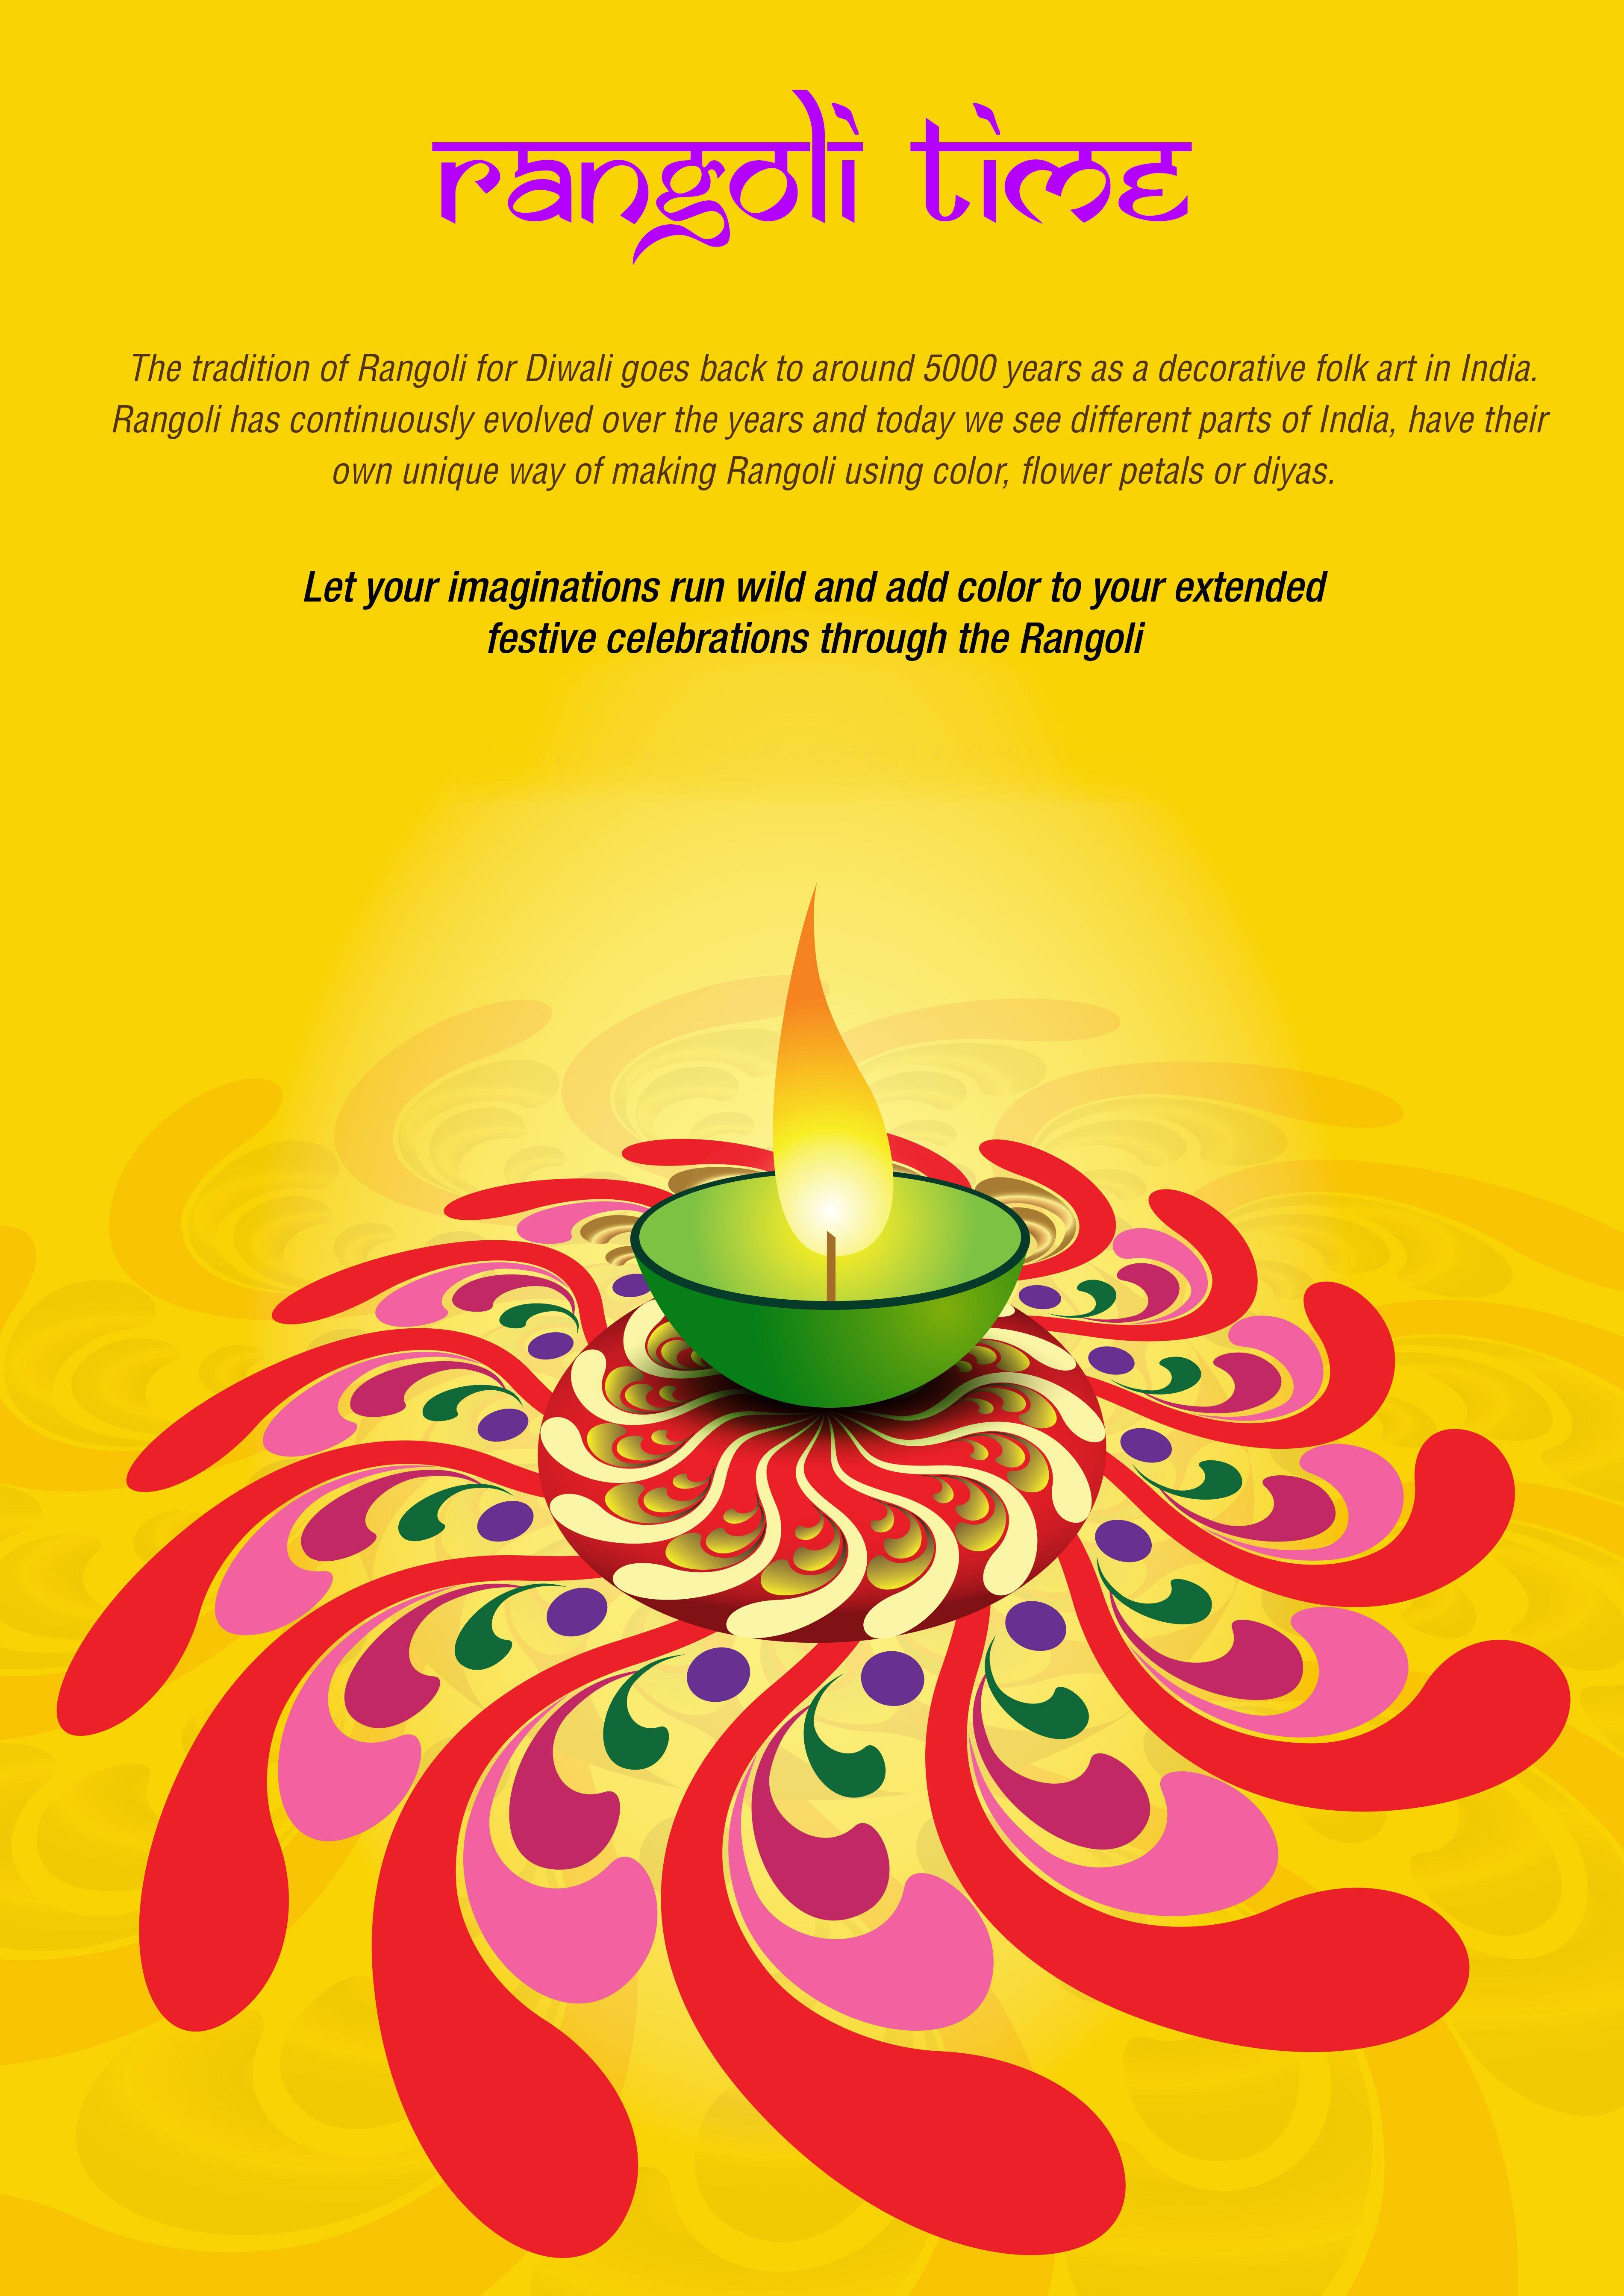 Neev celebrated Diwali with a Rangoli competition. Rangoli